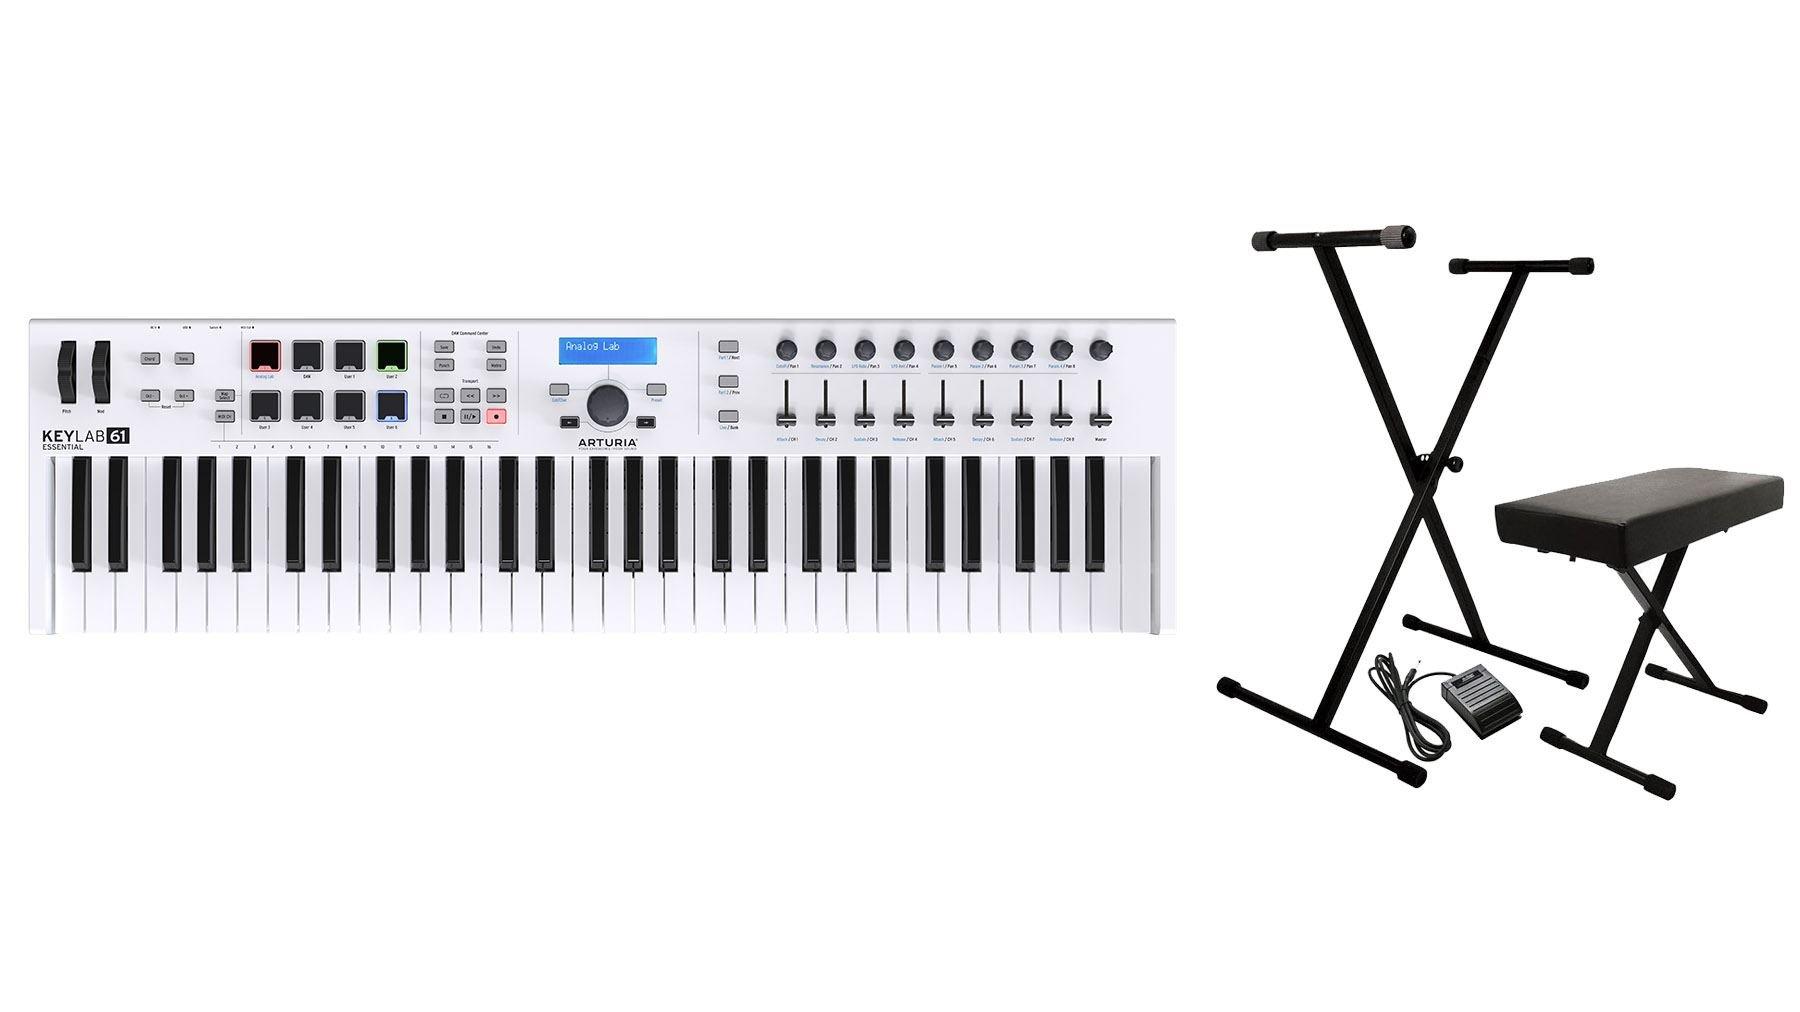 Arturia Keylab Essential 61 USB Keyboard Controller Bundle with Keyboard Stand, Stool, Sustain Pedal (2 Items)